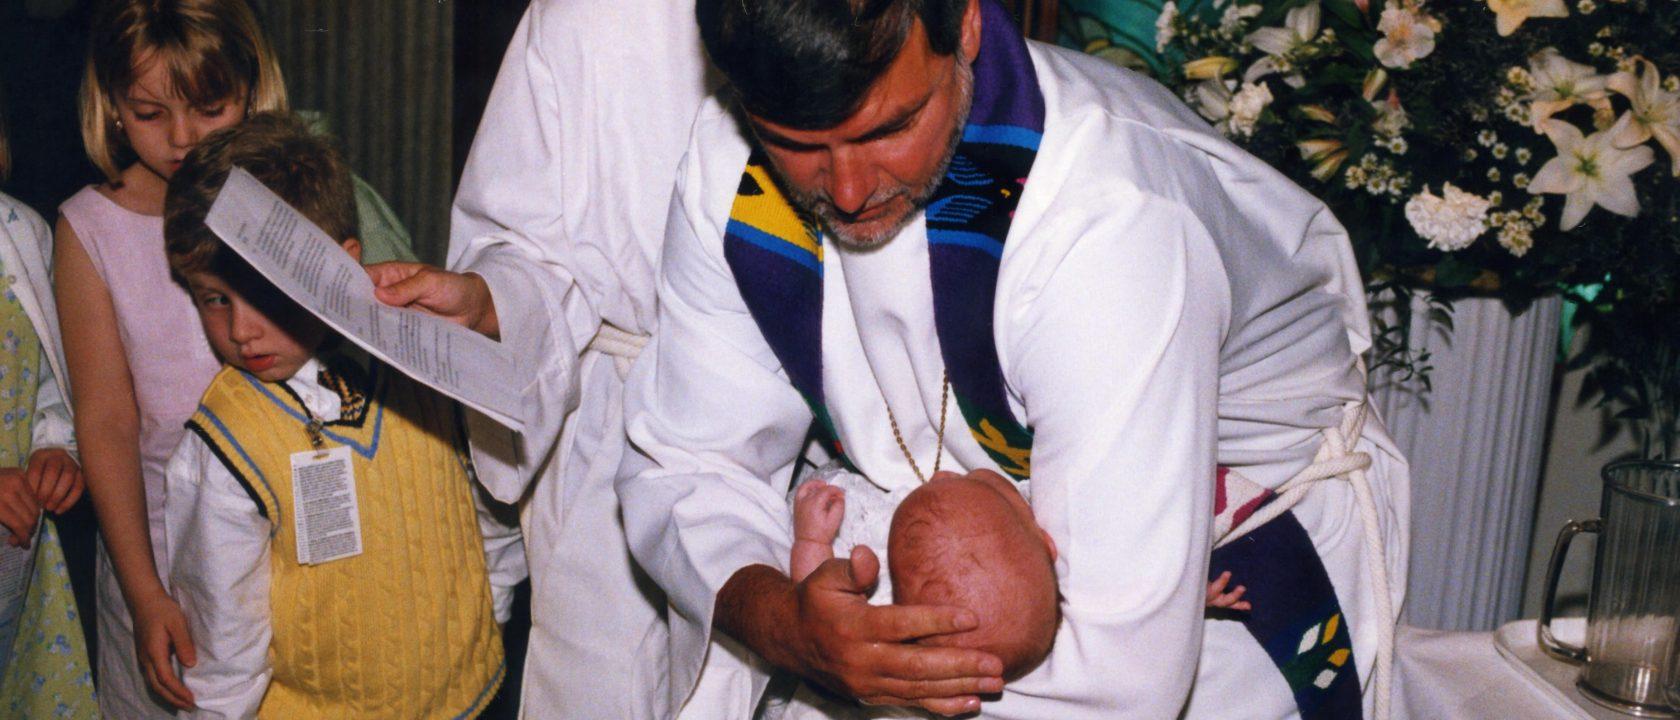 Bilingual Priest